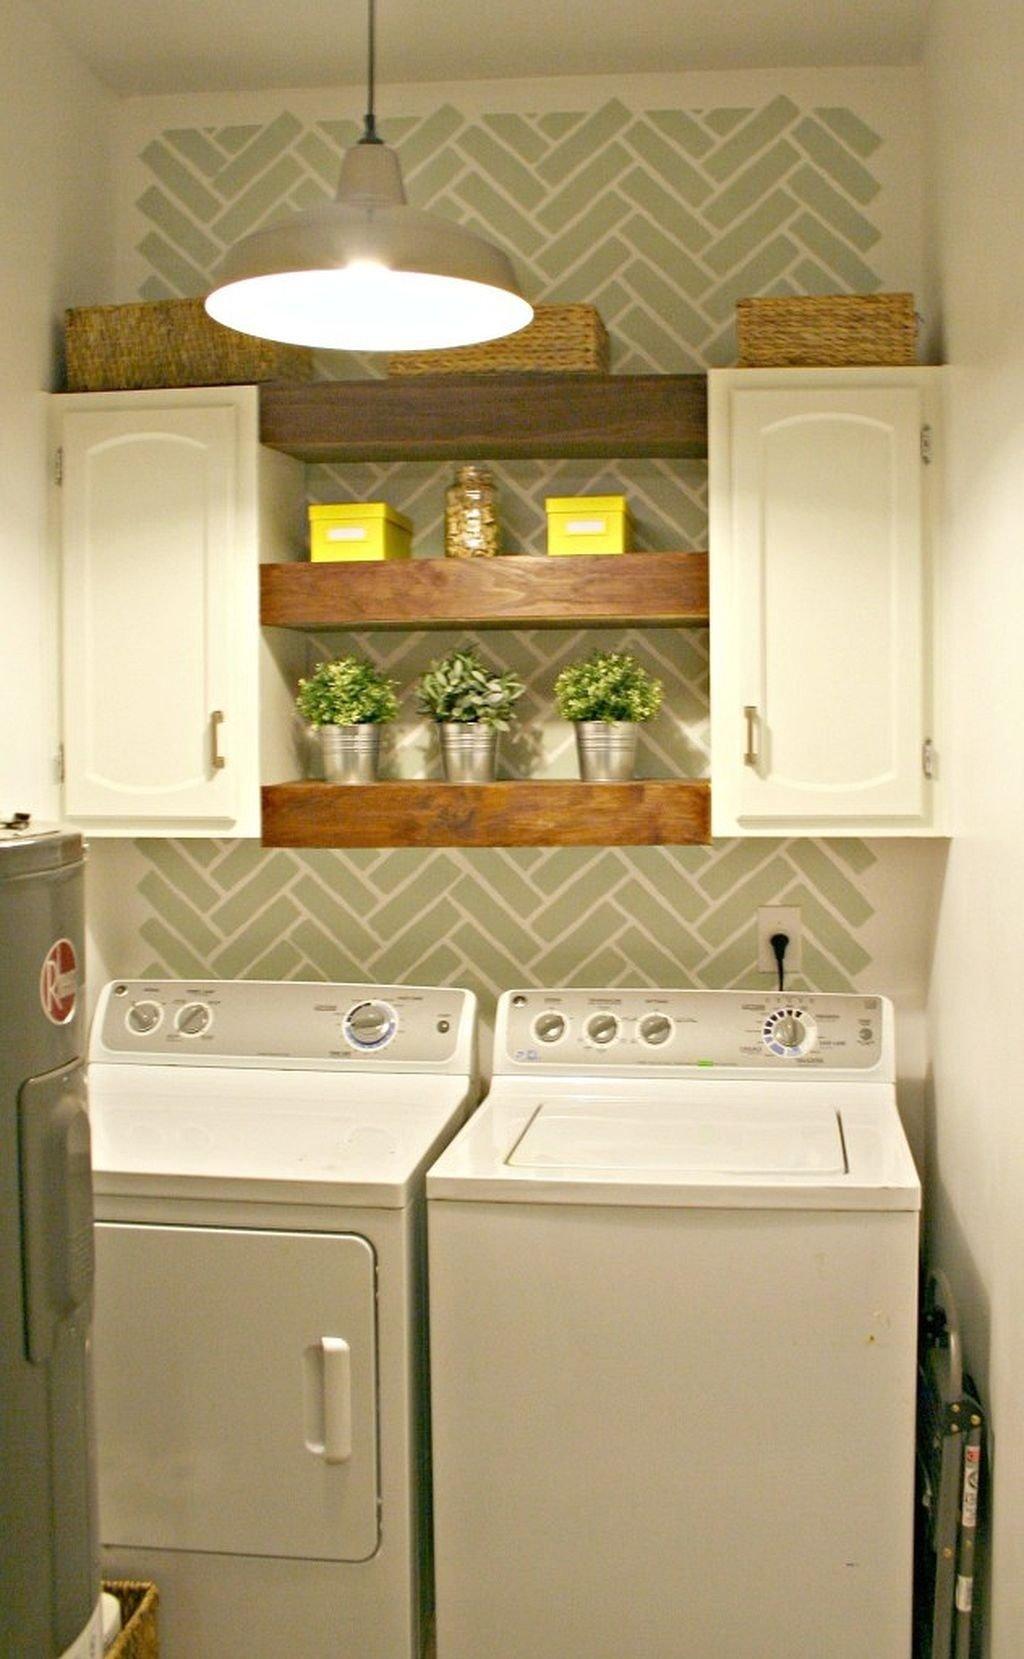 10 Perfect Laundry Room Ideas Small Space 64 tiny space laundry room storage ideas laundry room organization 1